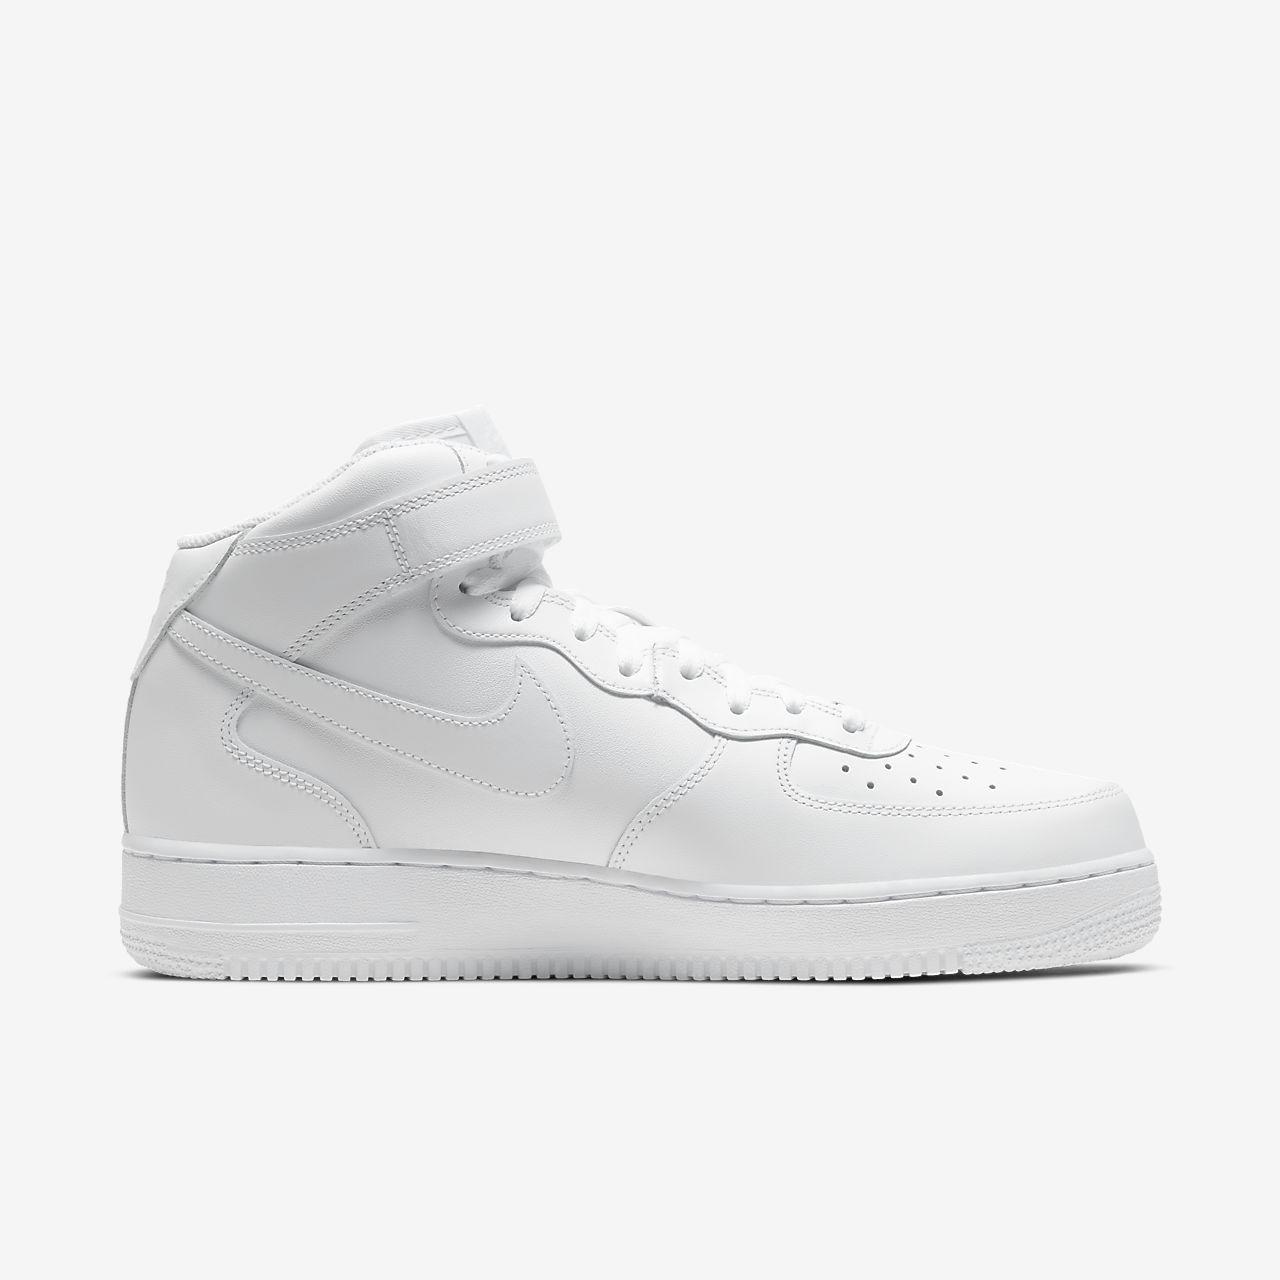 best website 25af7 6e9c4 ... Nike Air Force 1 Mid  07 Erkek Ayakkabısı